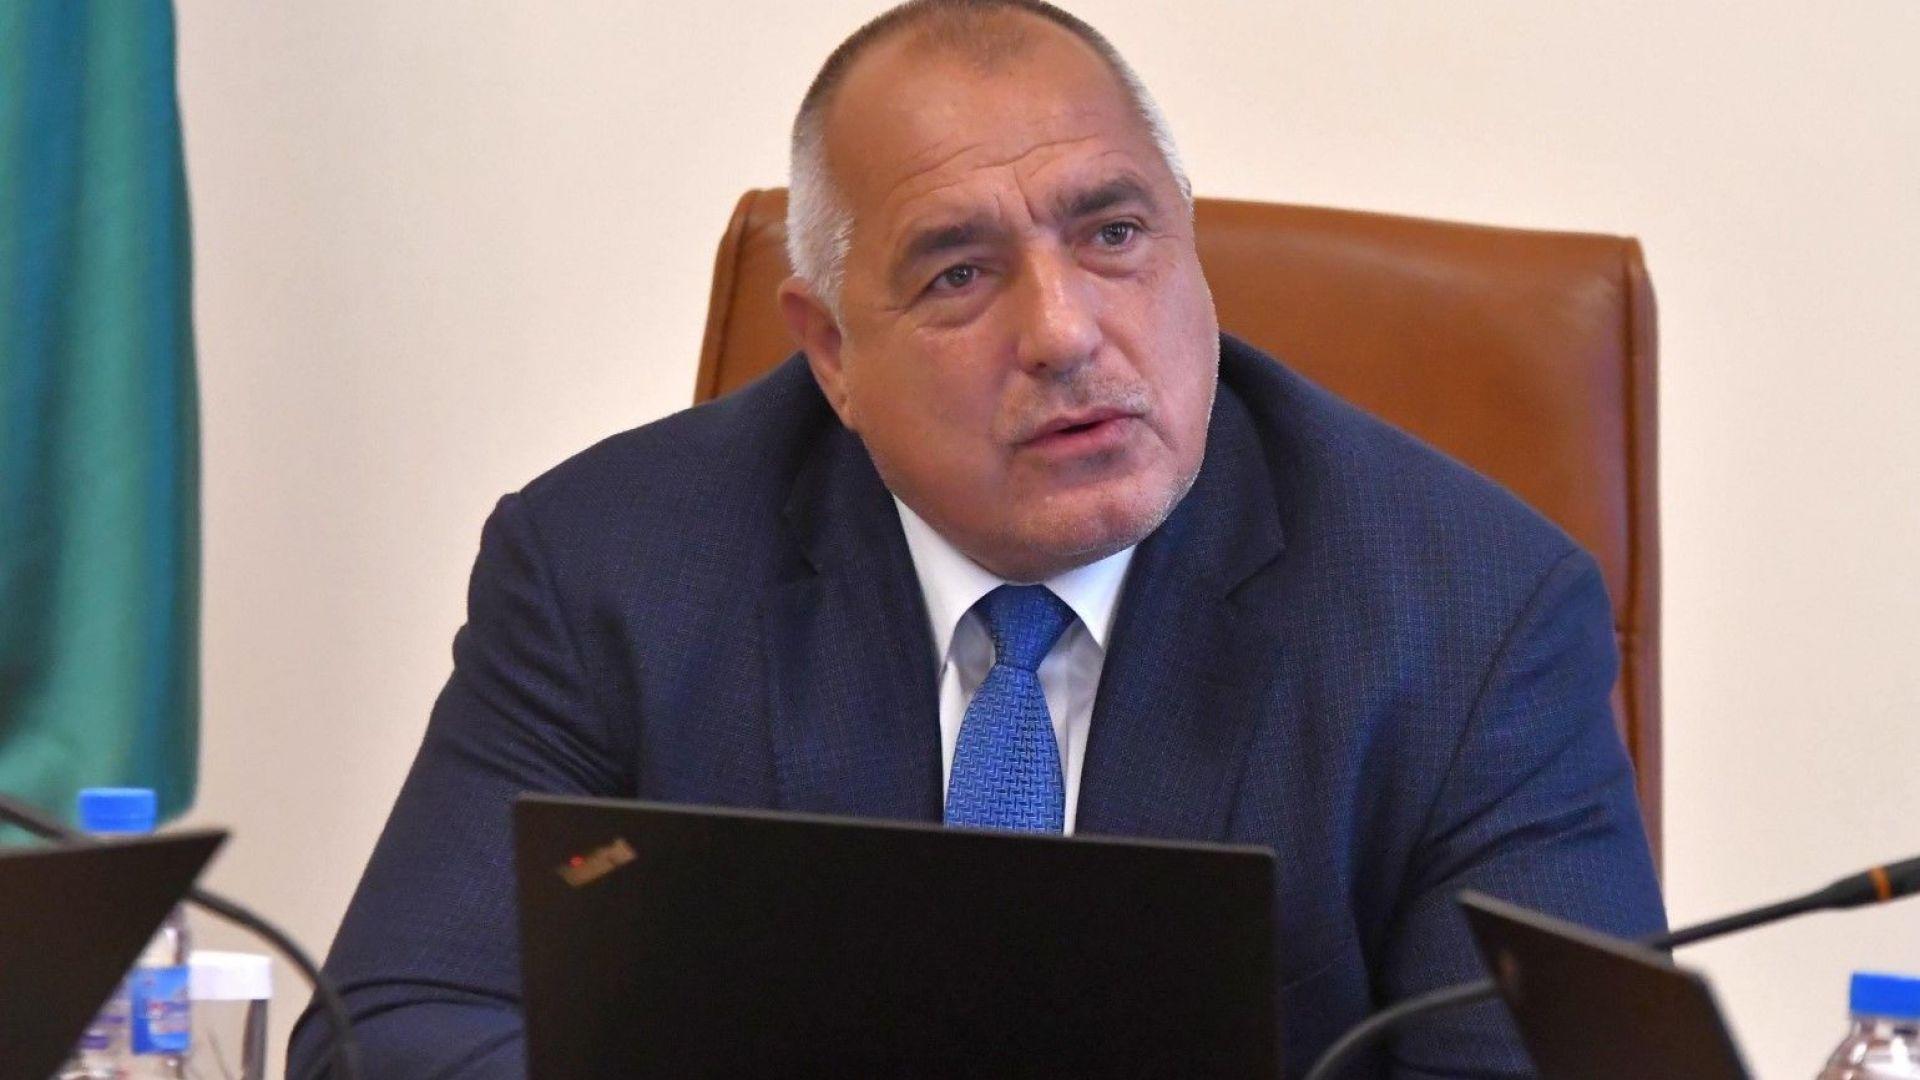 Борисов: Не искам да има недостиг на линейка, лекарство, легло